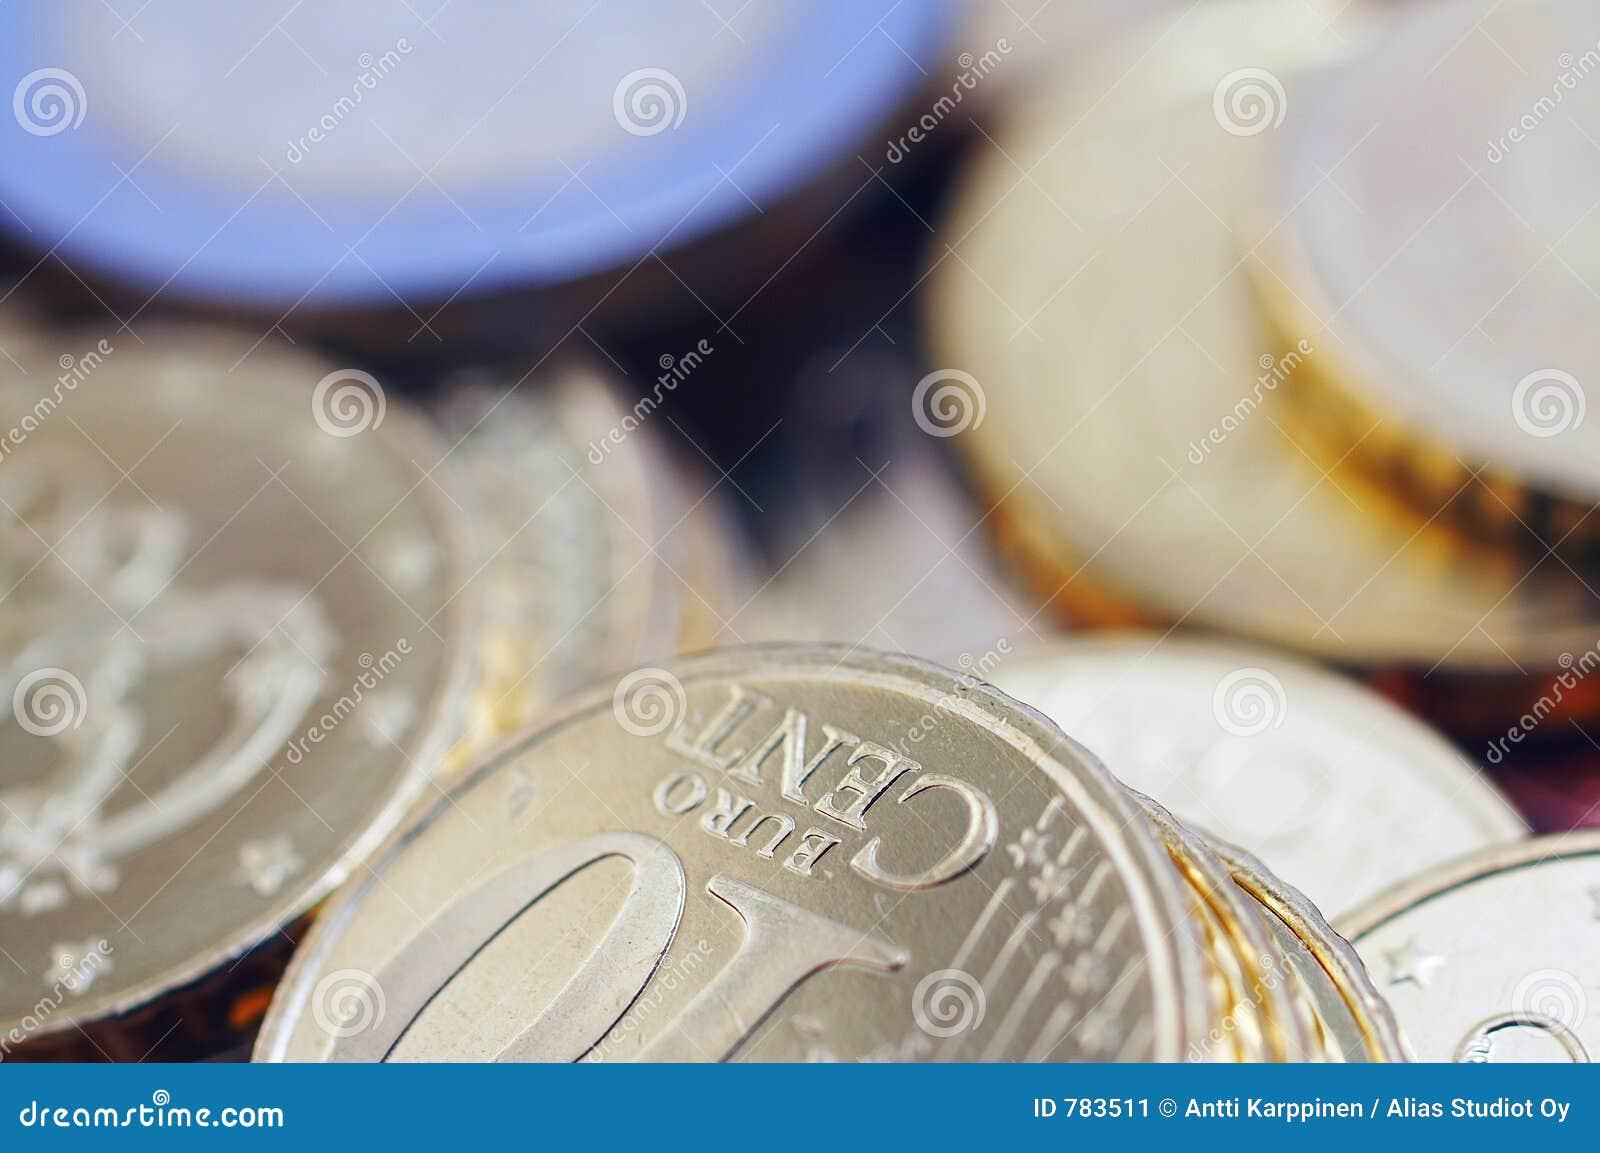 Uncirculated euro coins